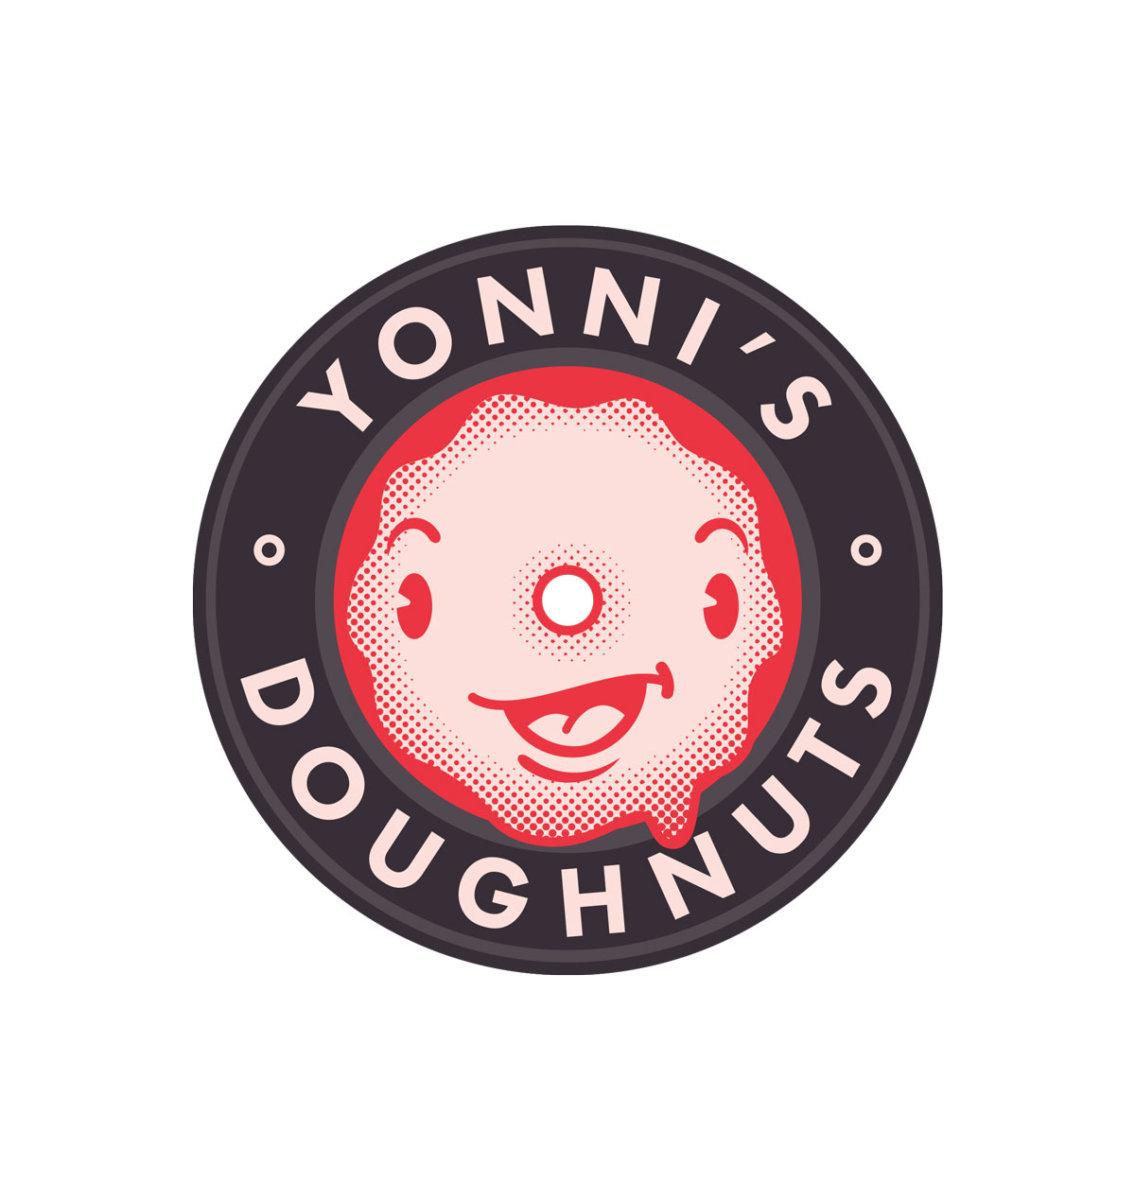 Yonni's Doughnuts Mascot - Aaron Bergunder